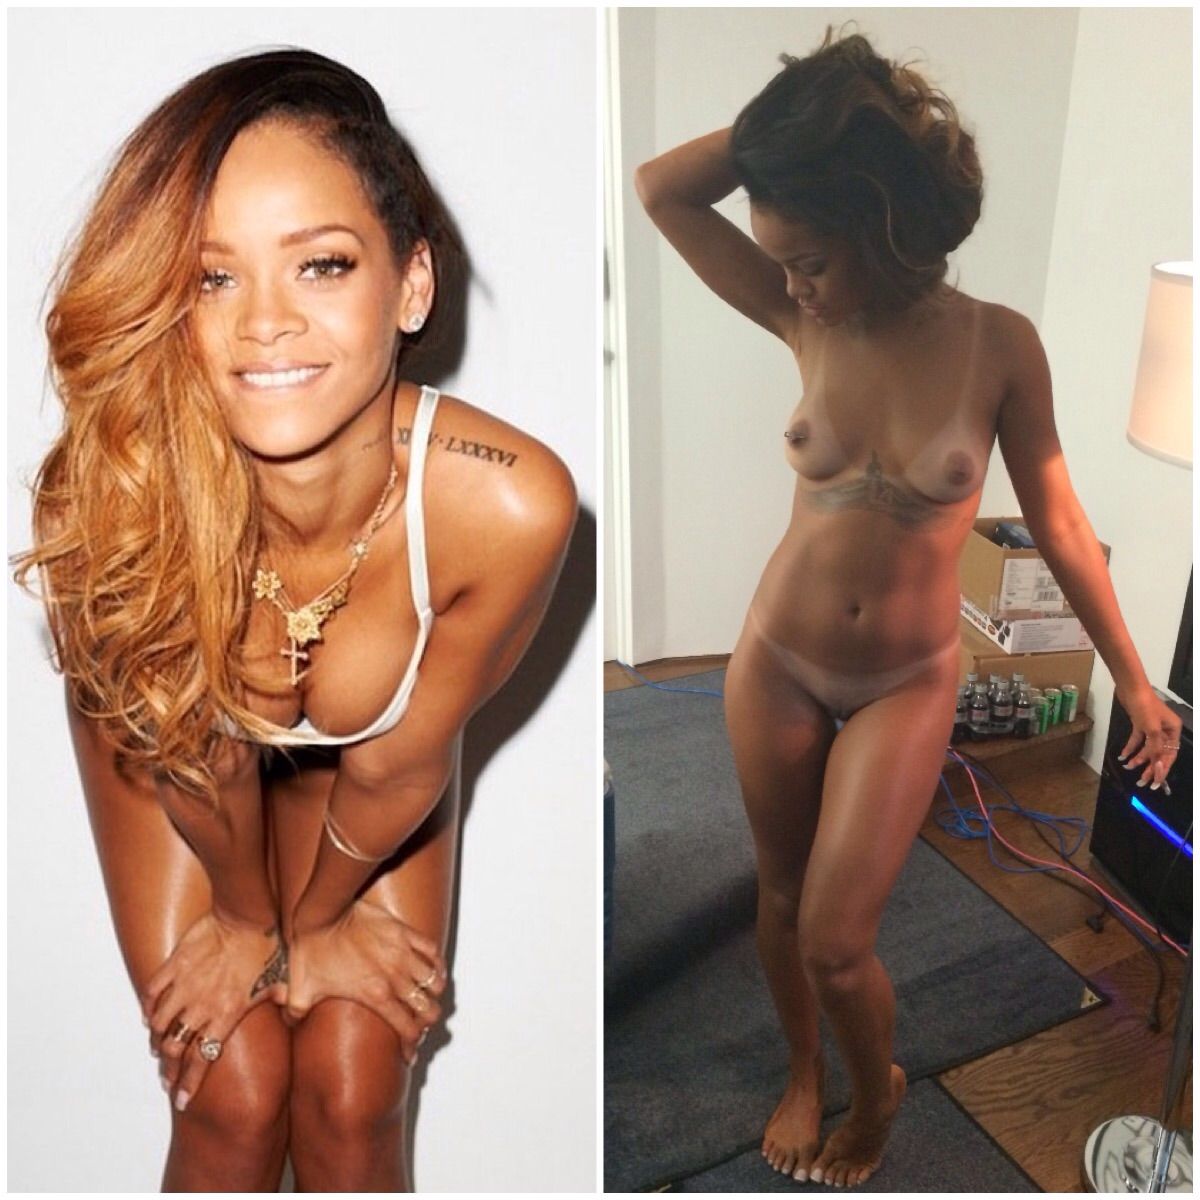 Rihanna goes blonde